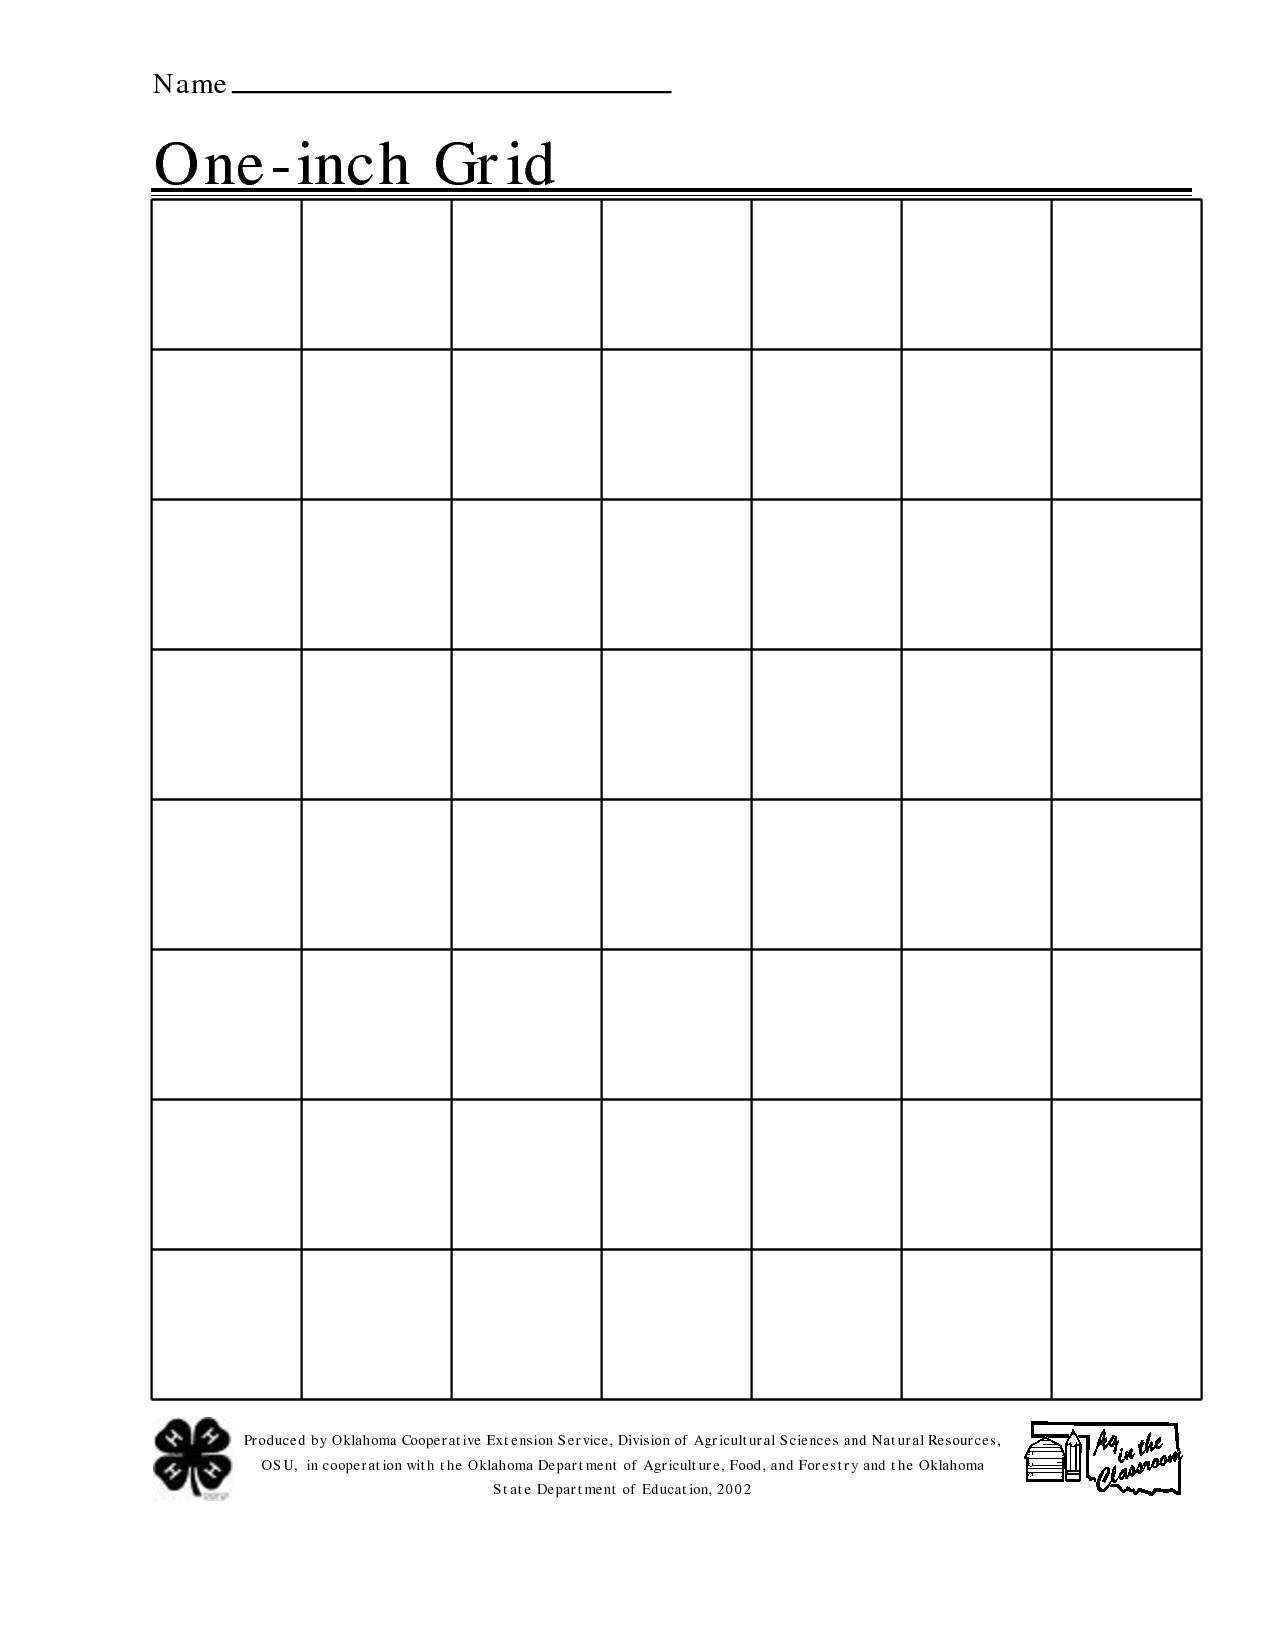 Free Printable 1 Inch Grid Paper | Math | Printable Graph Paper - One Inch Graph Paper Free Printable